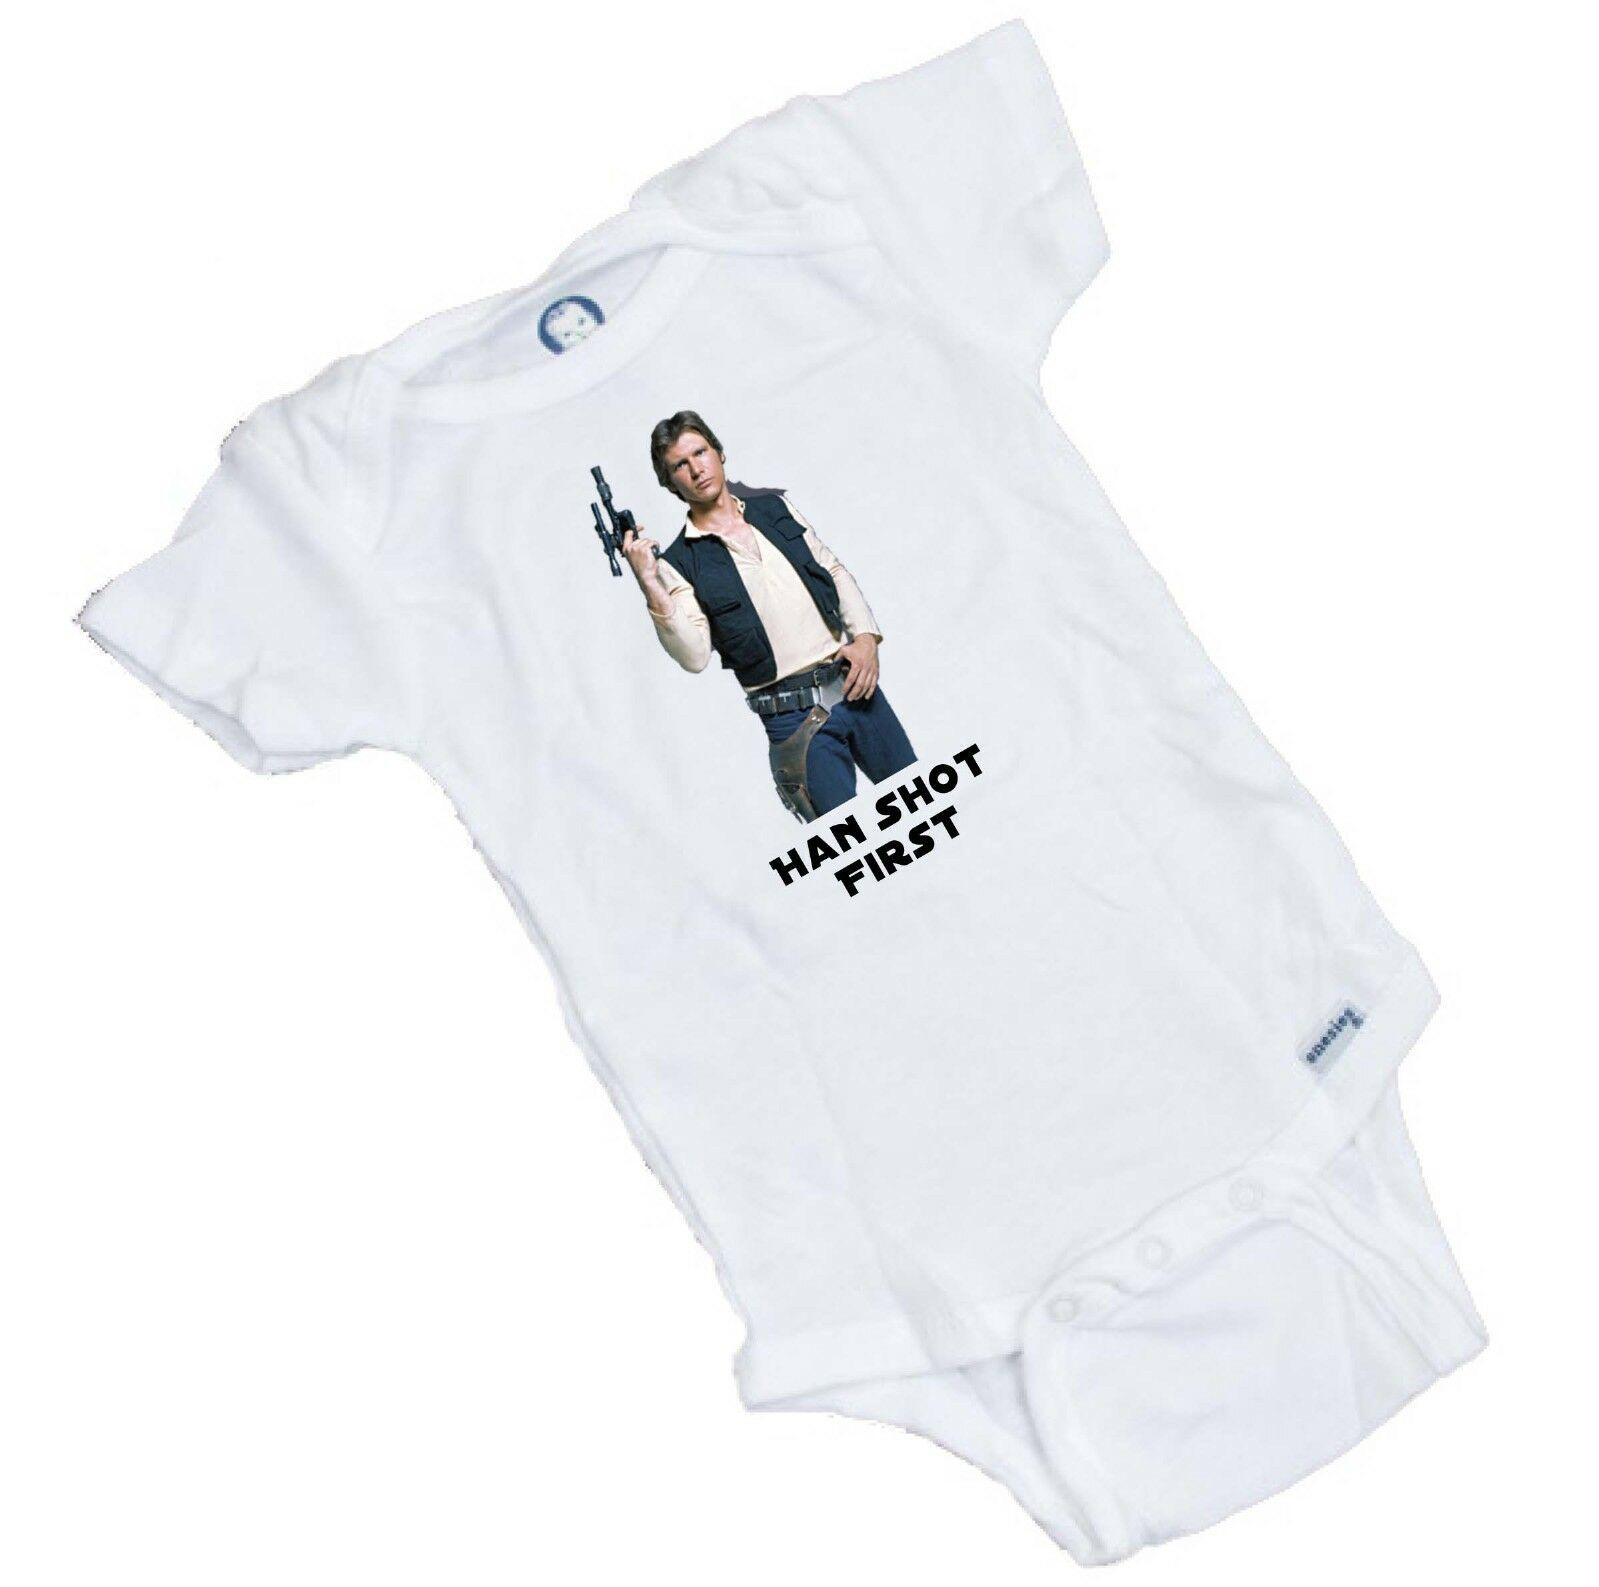 Bodysuit or Tee Shirt   BABY SHOWER GIFT Han Shot First Star Wars Funny Onesie